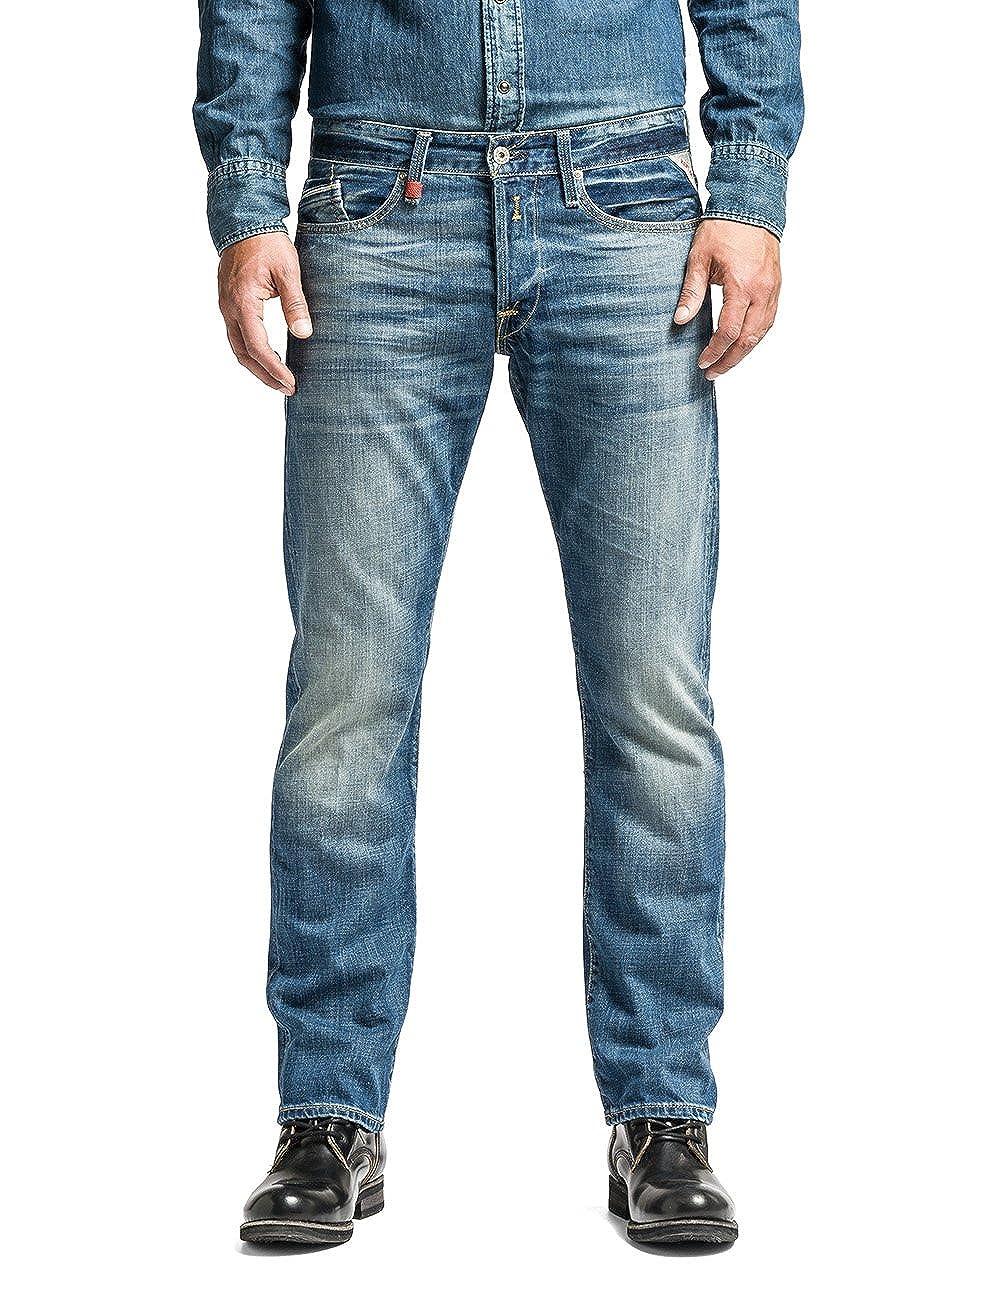 TALLA 34W / 30L. Replay Waitom, Jeans Hombre